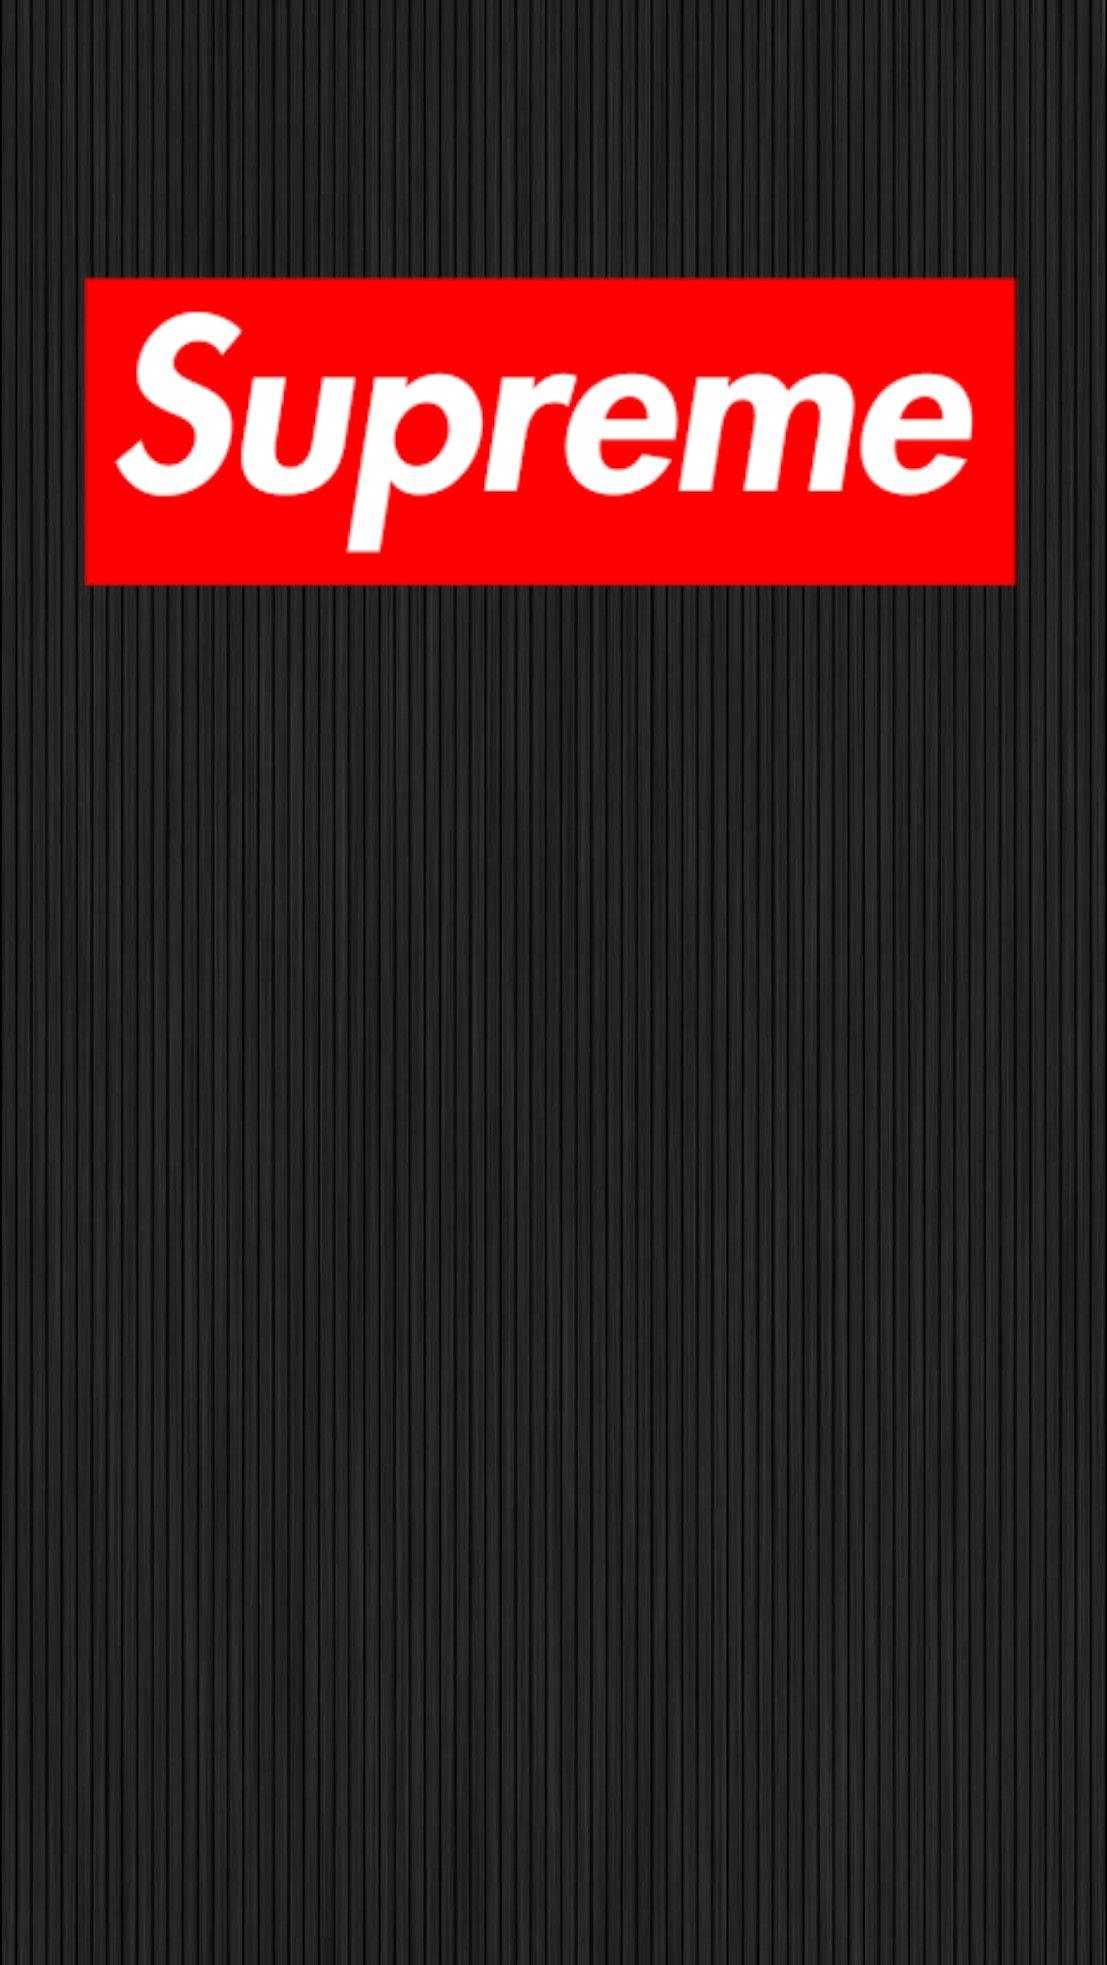 supreme android ios wallpaper black シュープリーム, Iphone